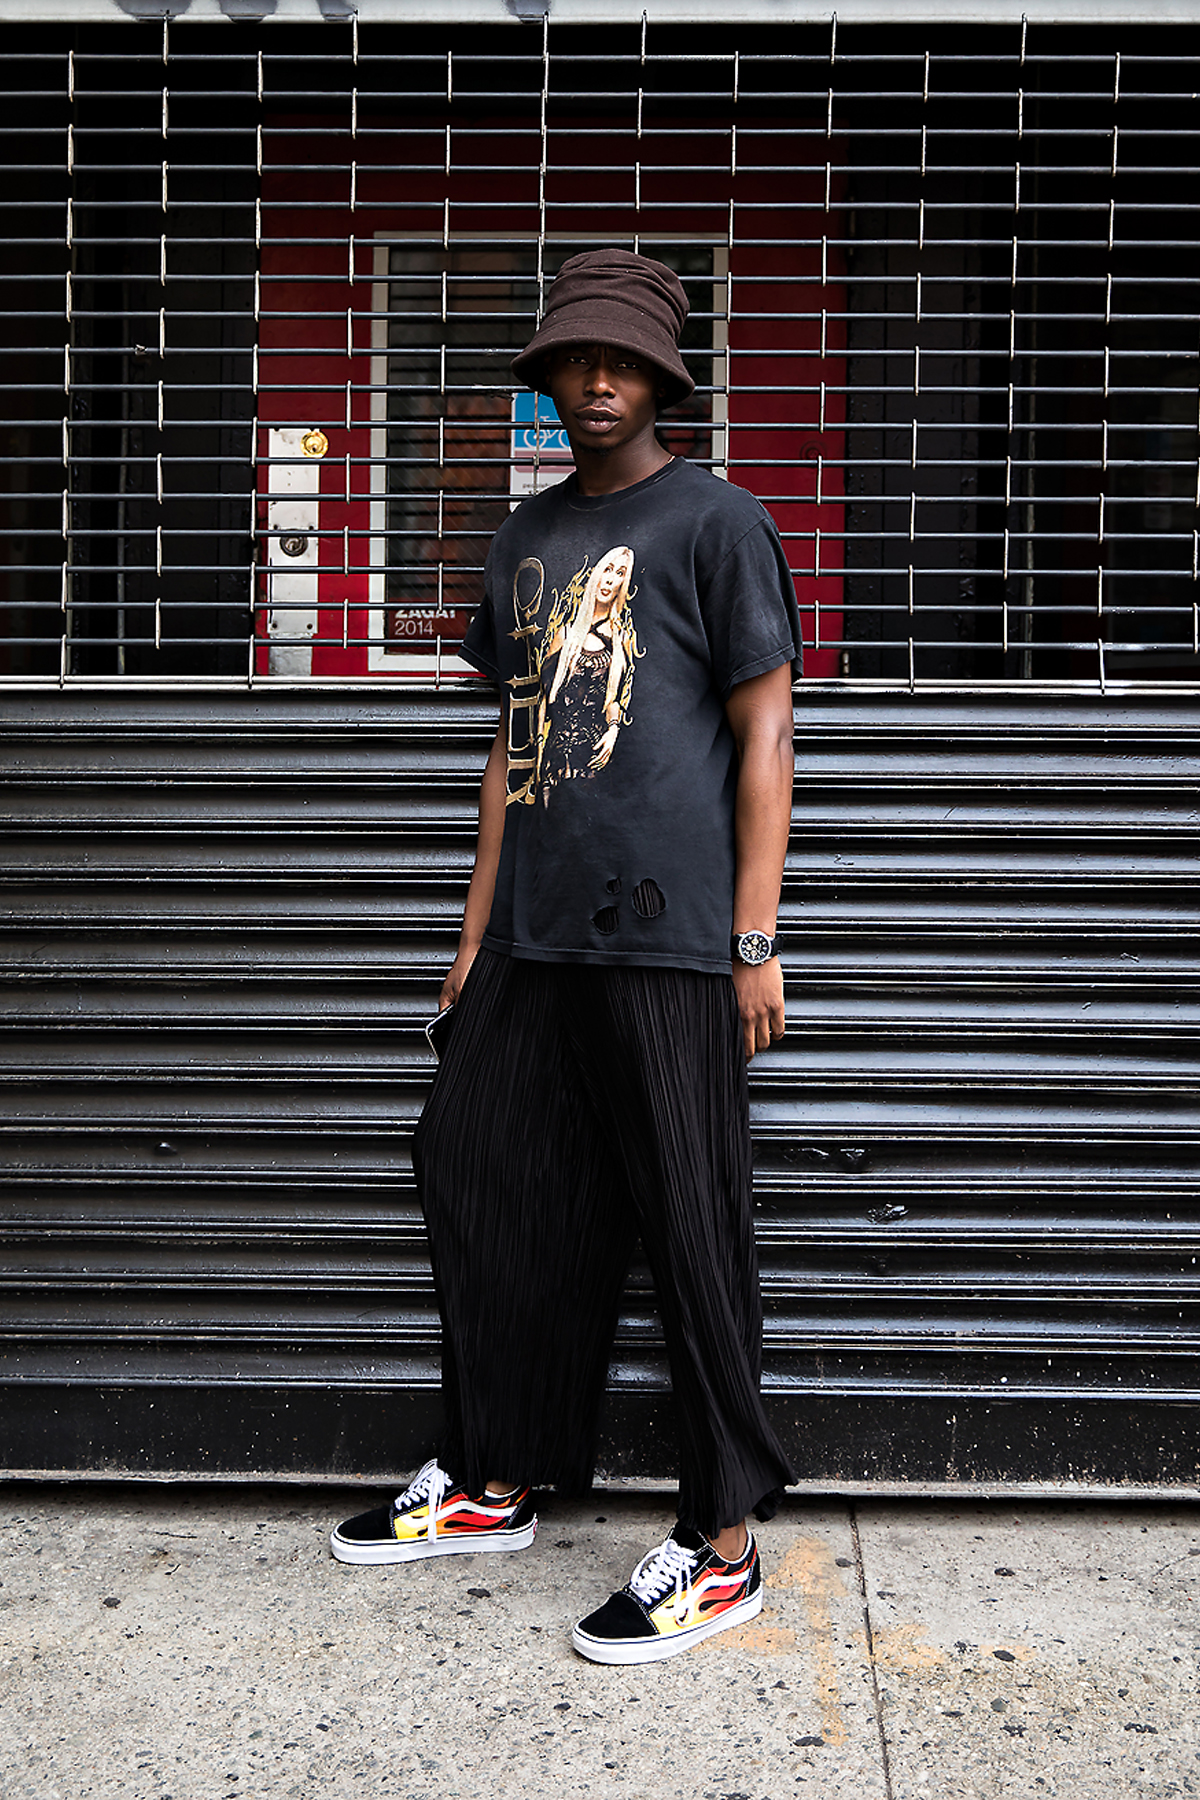 Ian Rolenr, Street Fashion 2017 in New York.jpg